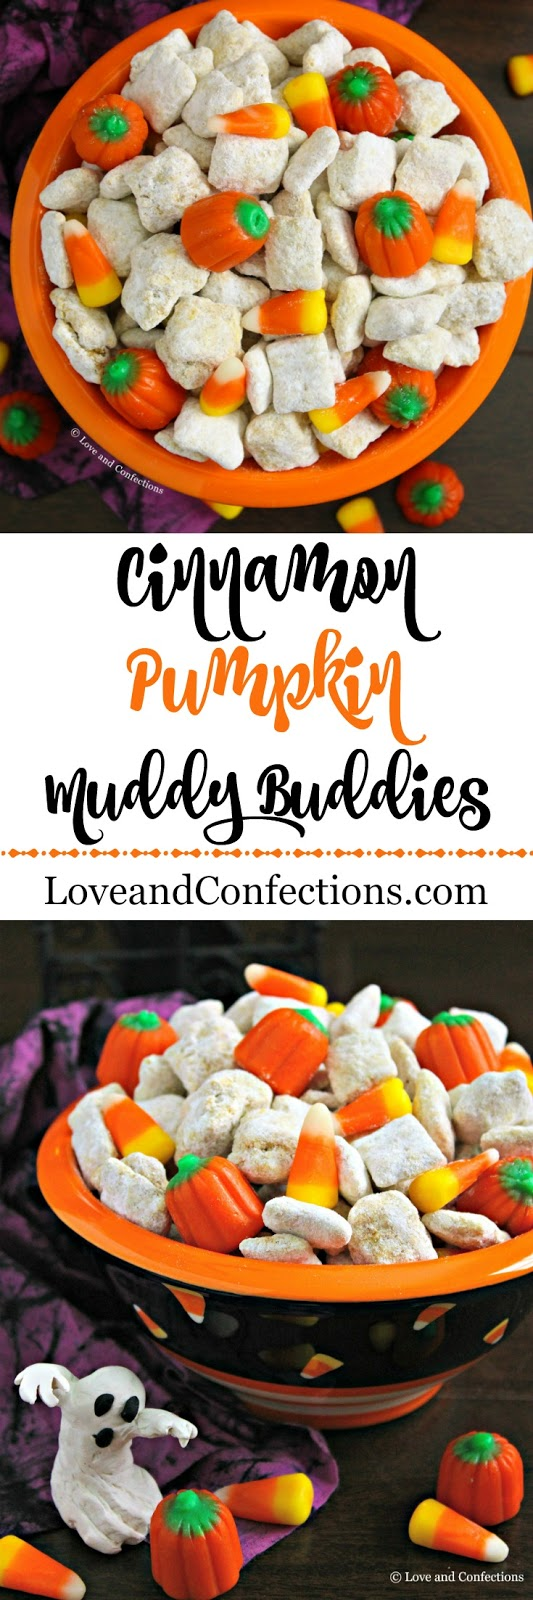 Cinnamon Pumpkin Muddy Buddies from LoveandConfections.com #PumpkinWeek